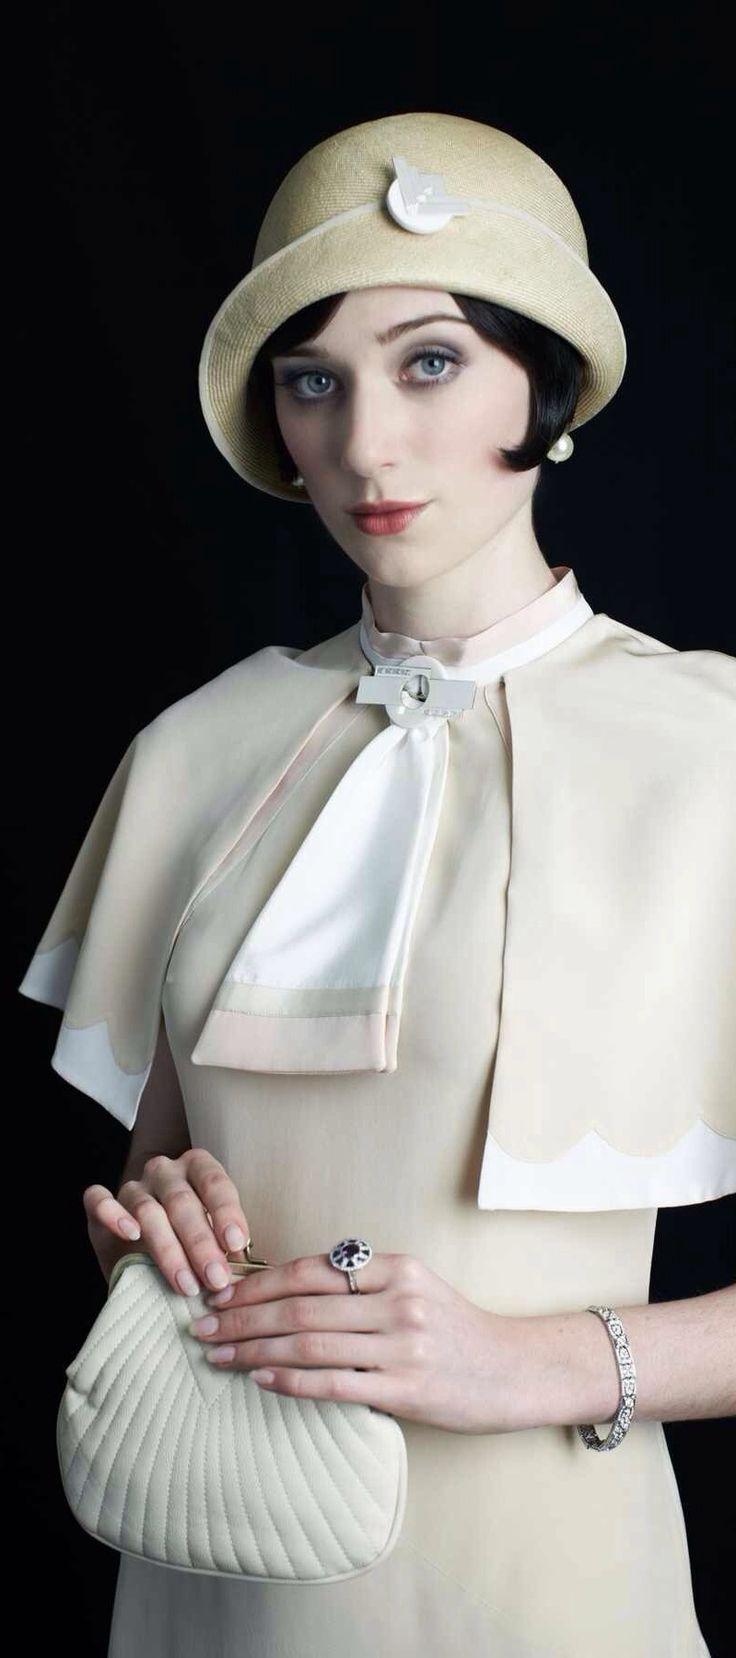 Elizabeth Debicki as Jordan Baker from 'The Great Gatsby' (2013). Costume Designer: Catherine Martin